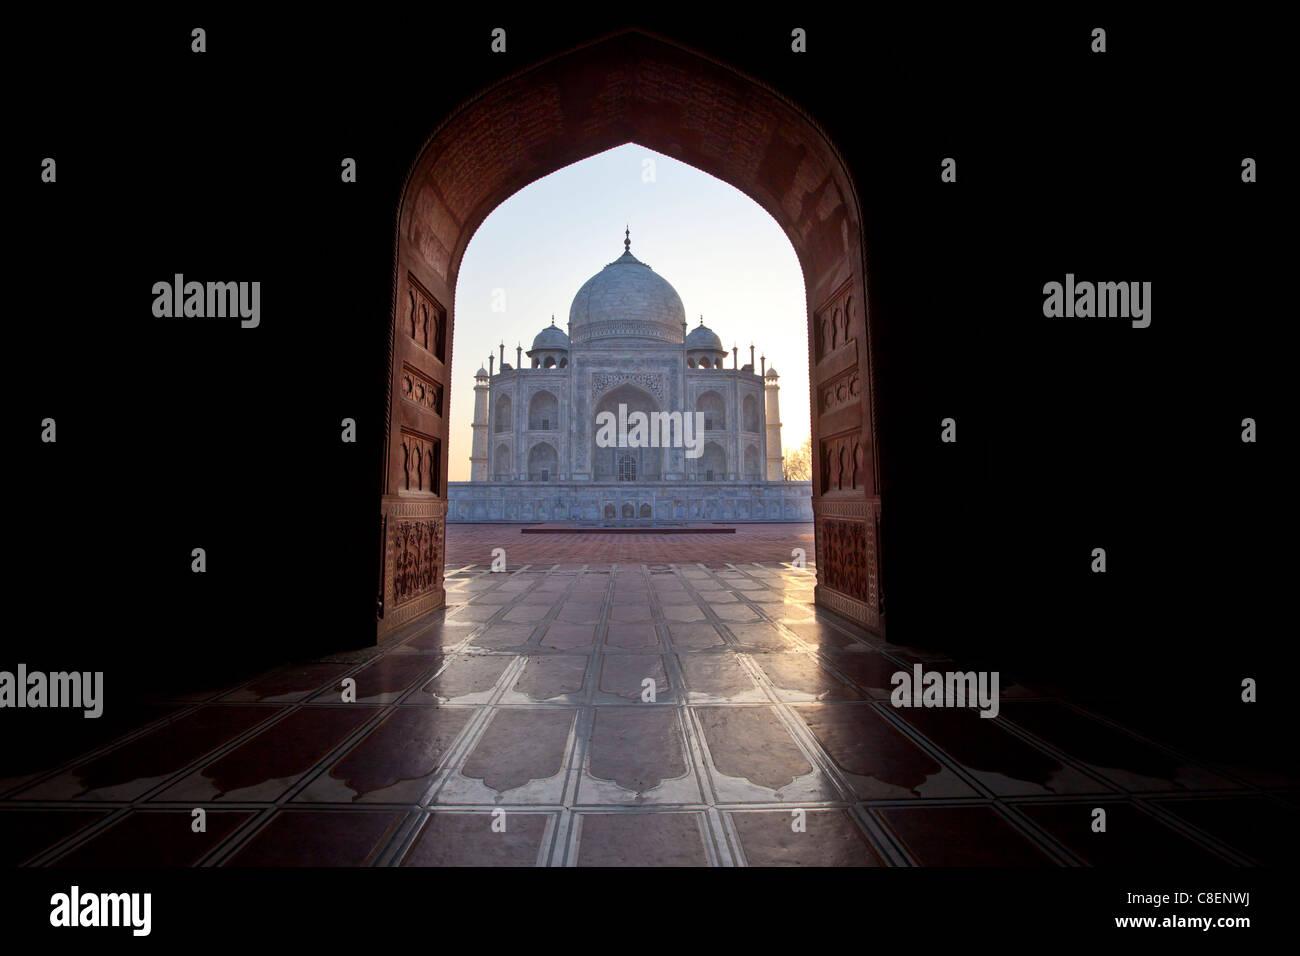 Taj Mahal mausoleum western view viewed from Taj Mahal Mosque with its prayer mat floor tiles at dawn, Uttar Pradesh, - Stock Image